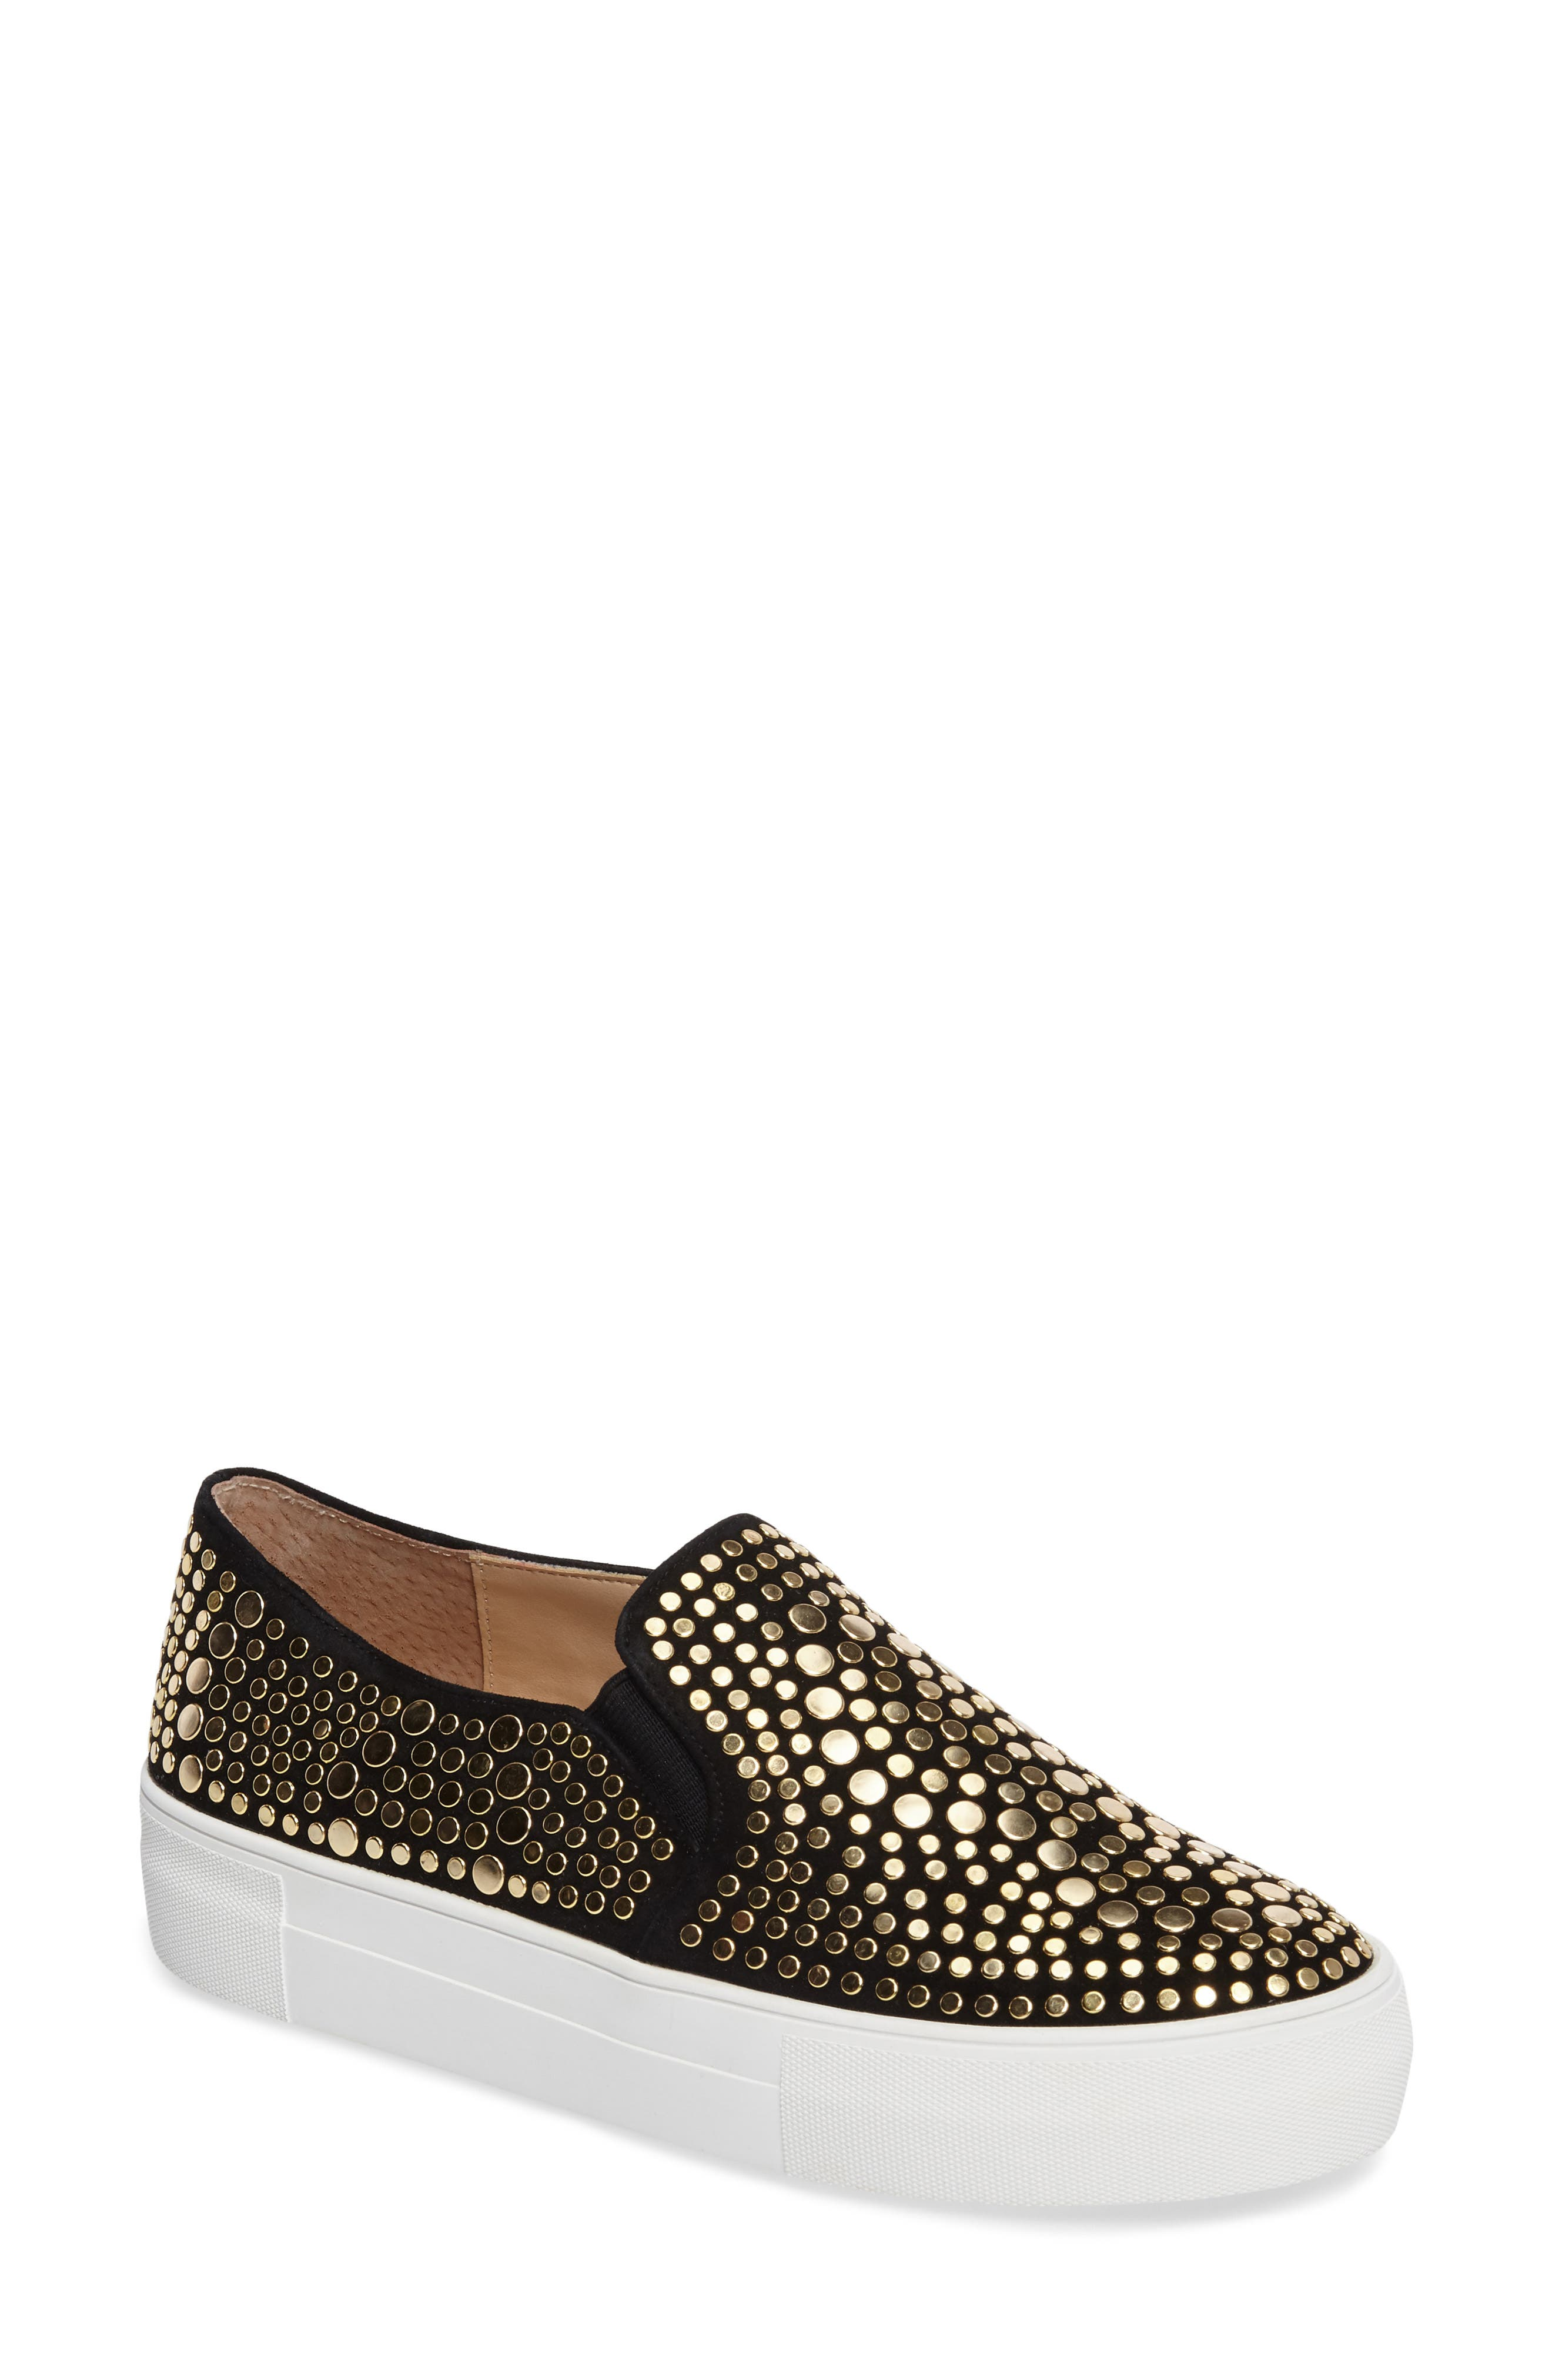 Main Image - Vince Camuto Kindra Stud Slip-On Sneaker (Women)